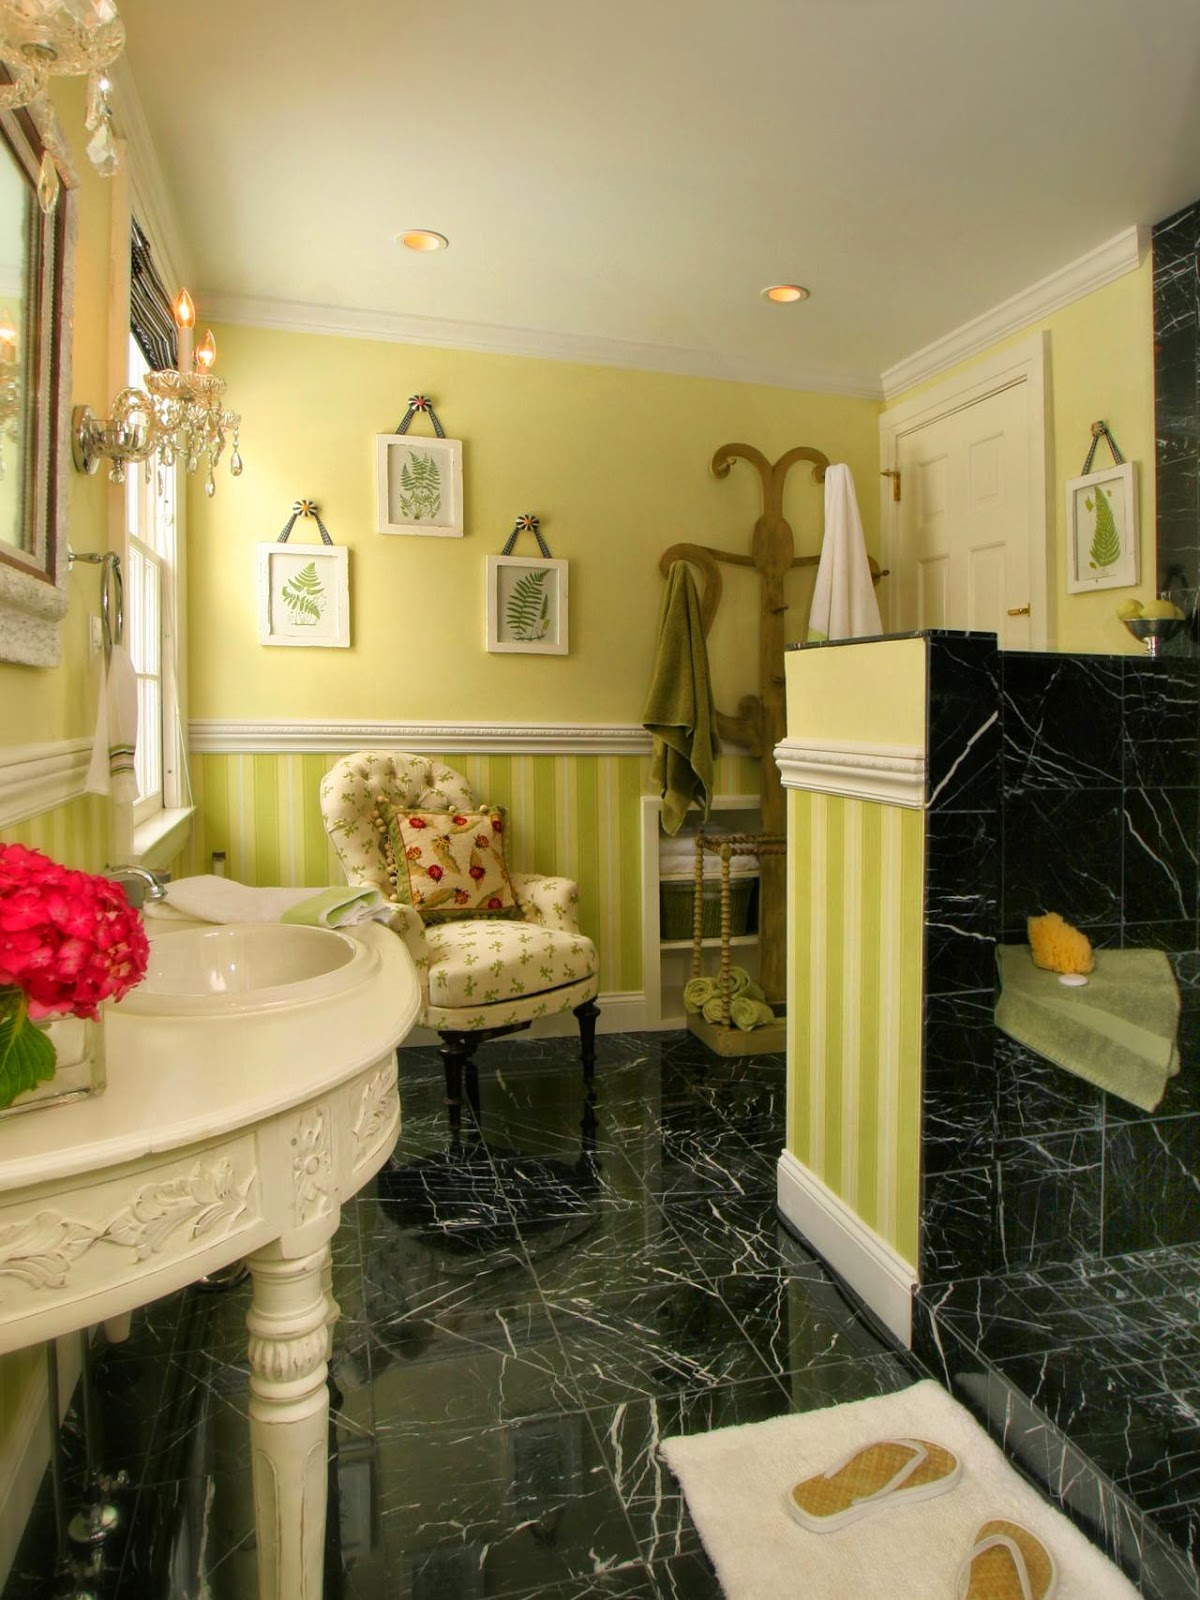 Black Bathroom tiles